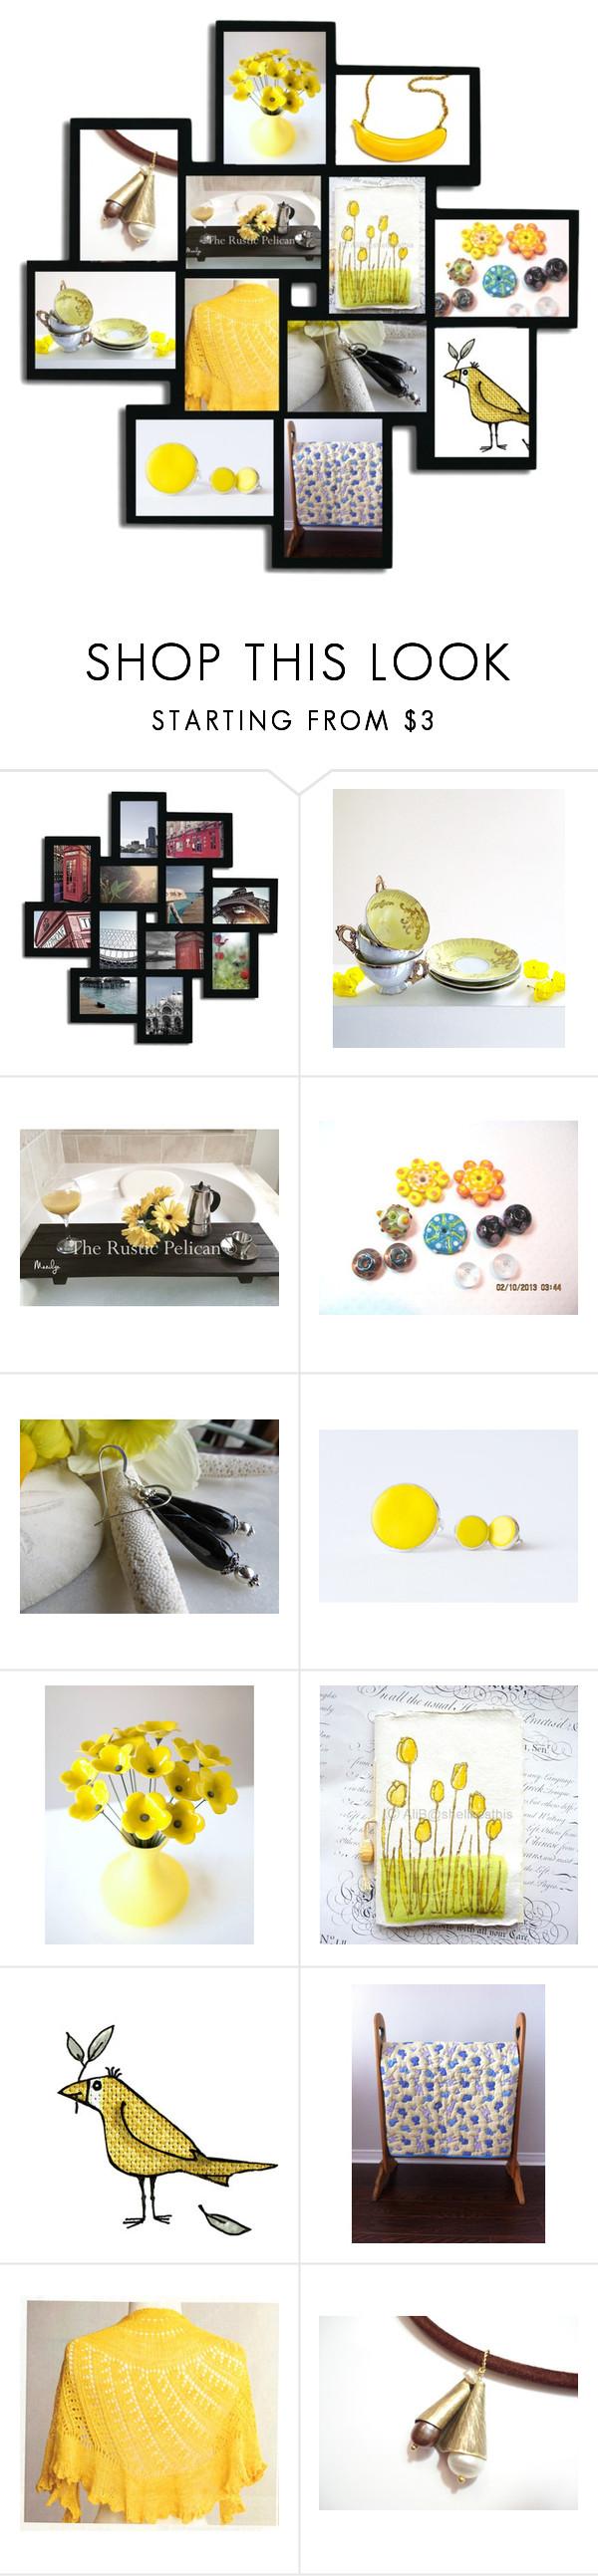 Interior design home book -  Sunny Day By Inspiredbyten On Polyvore Featuring Interior Interiors Interior Design